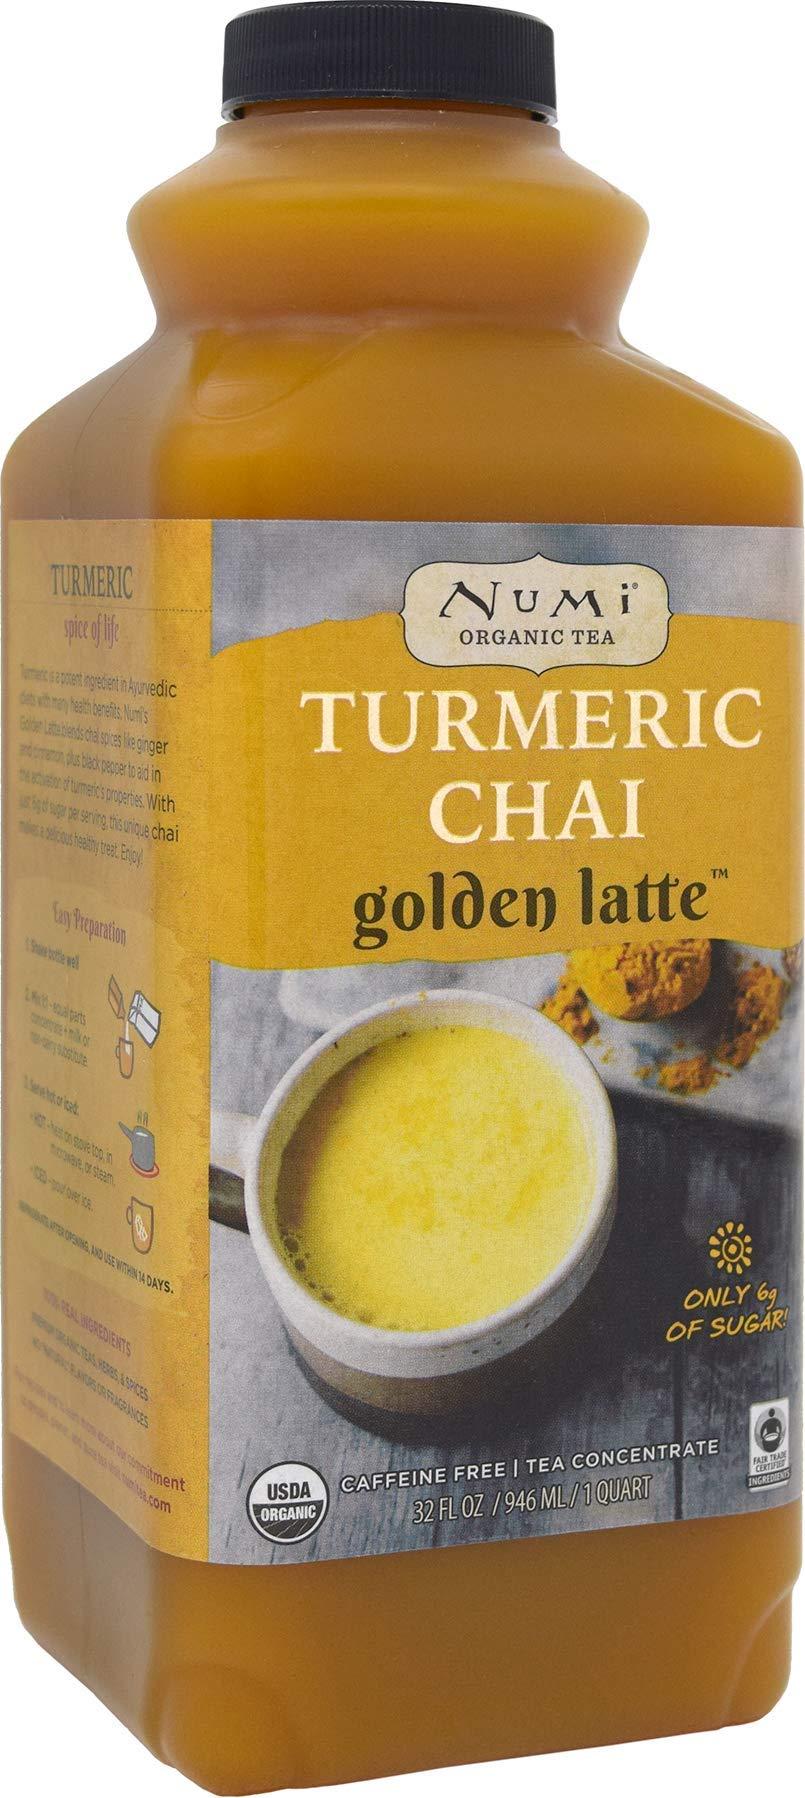 Numi Organic Tea Turmeric Chai Golden Latte Concentrate, 32 Ounces (Pack of 2)